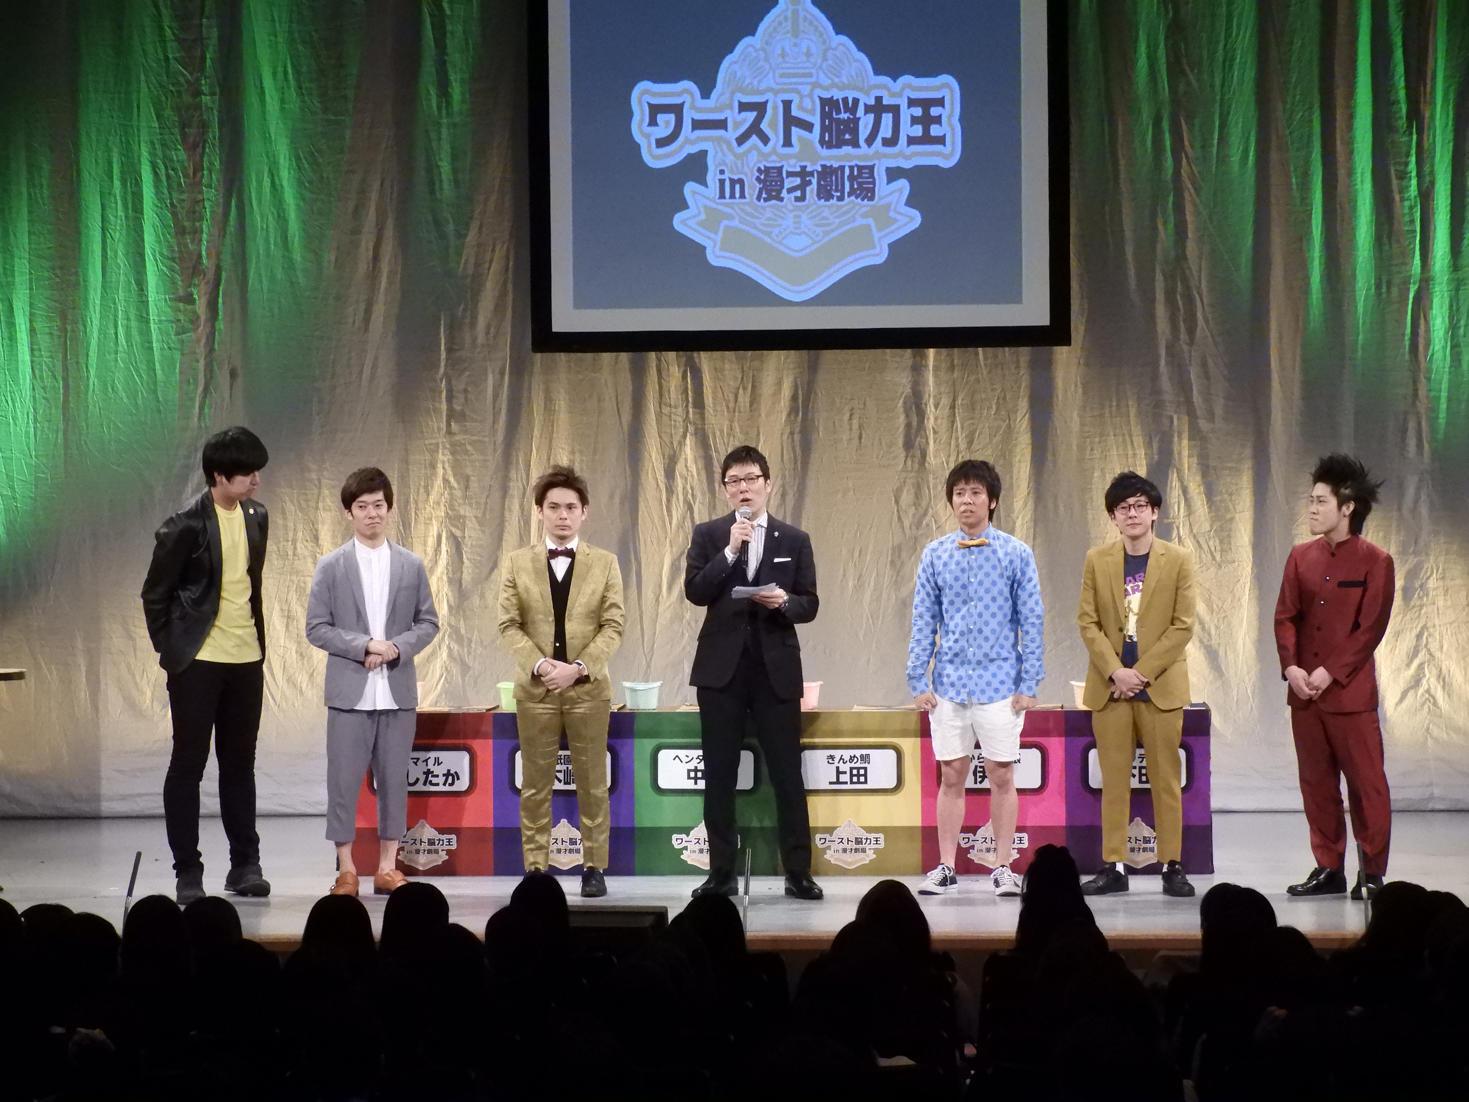 http://news.yoshimoto.co.jp/20180406111643-e725c57b174933ceefe3def8238bab99301c15df.jpg